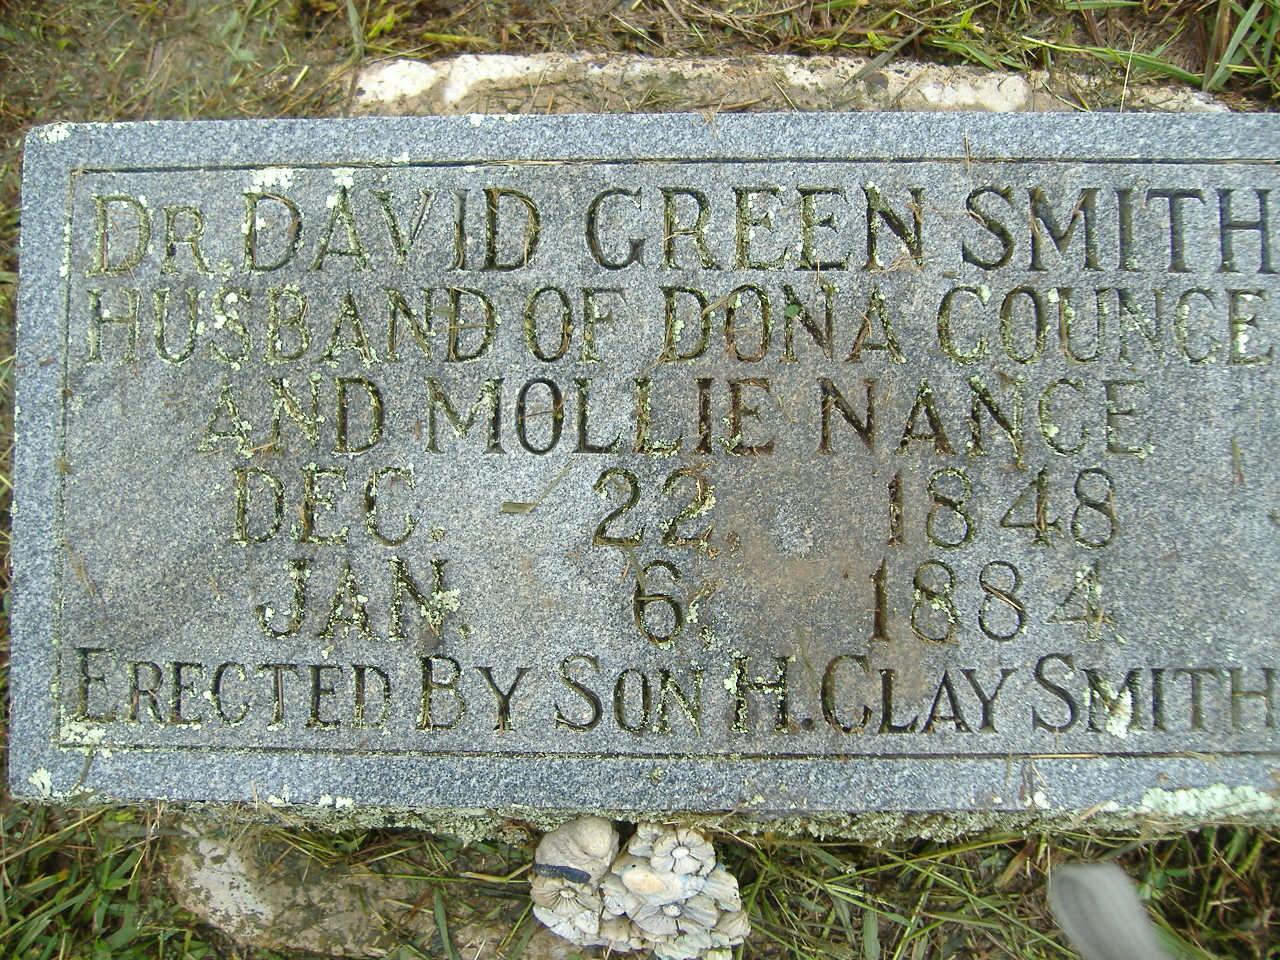 David Green Smith